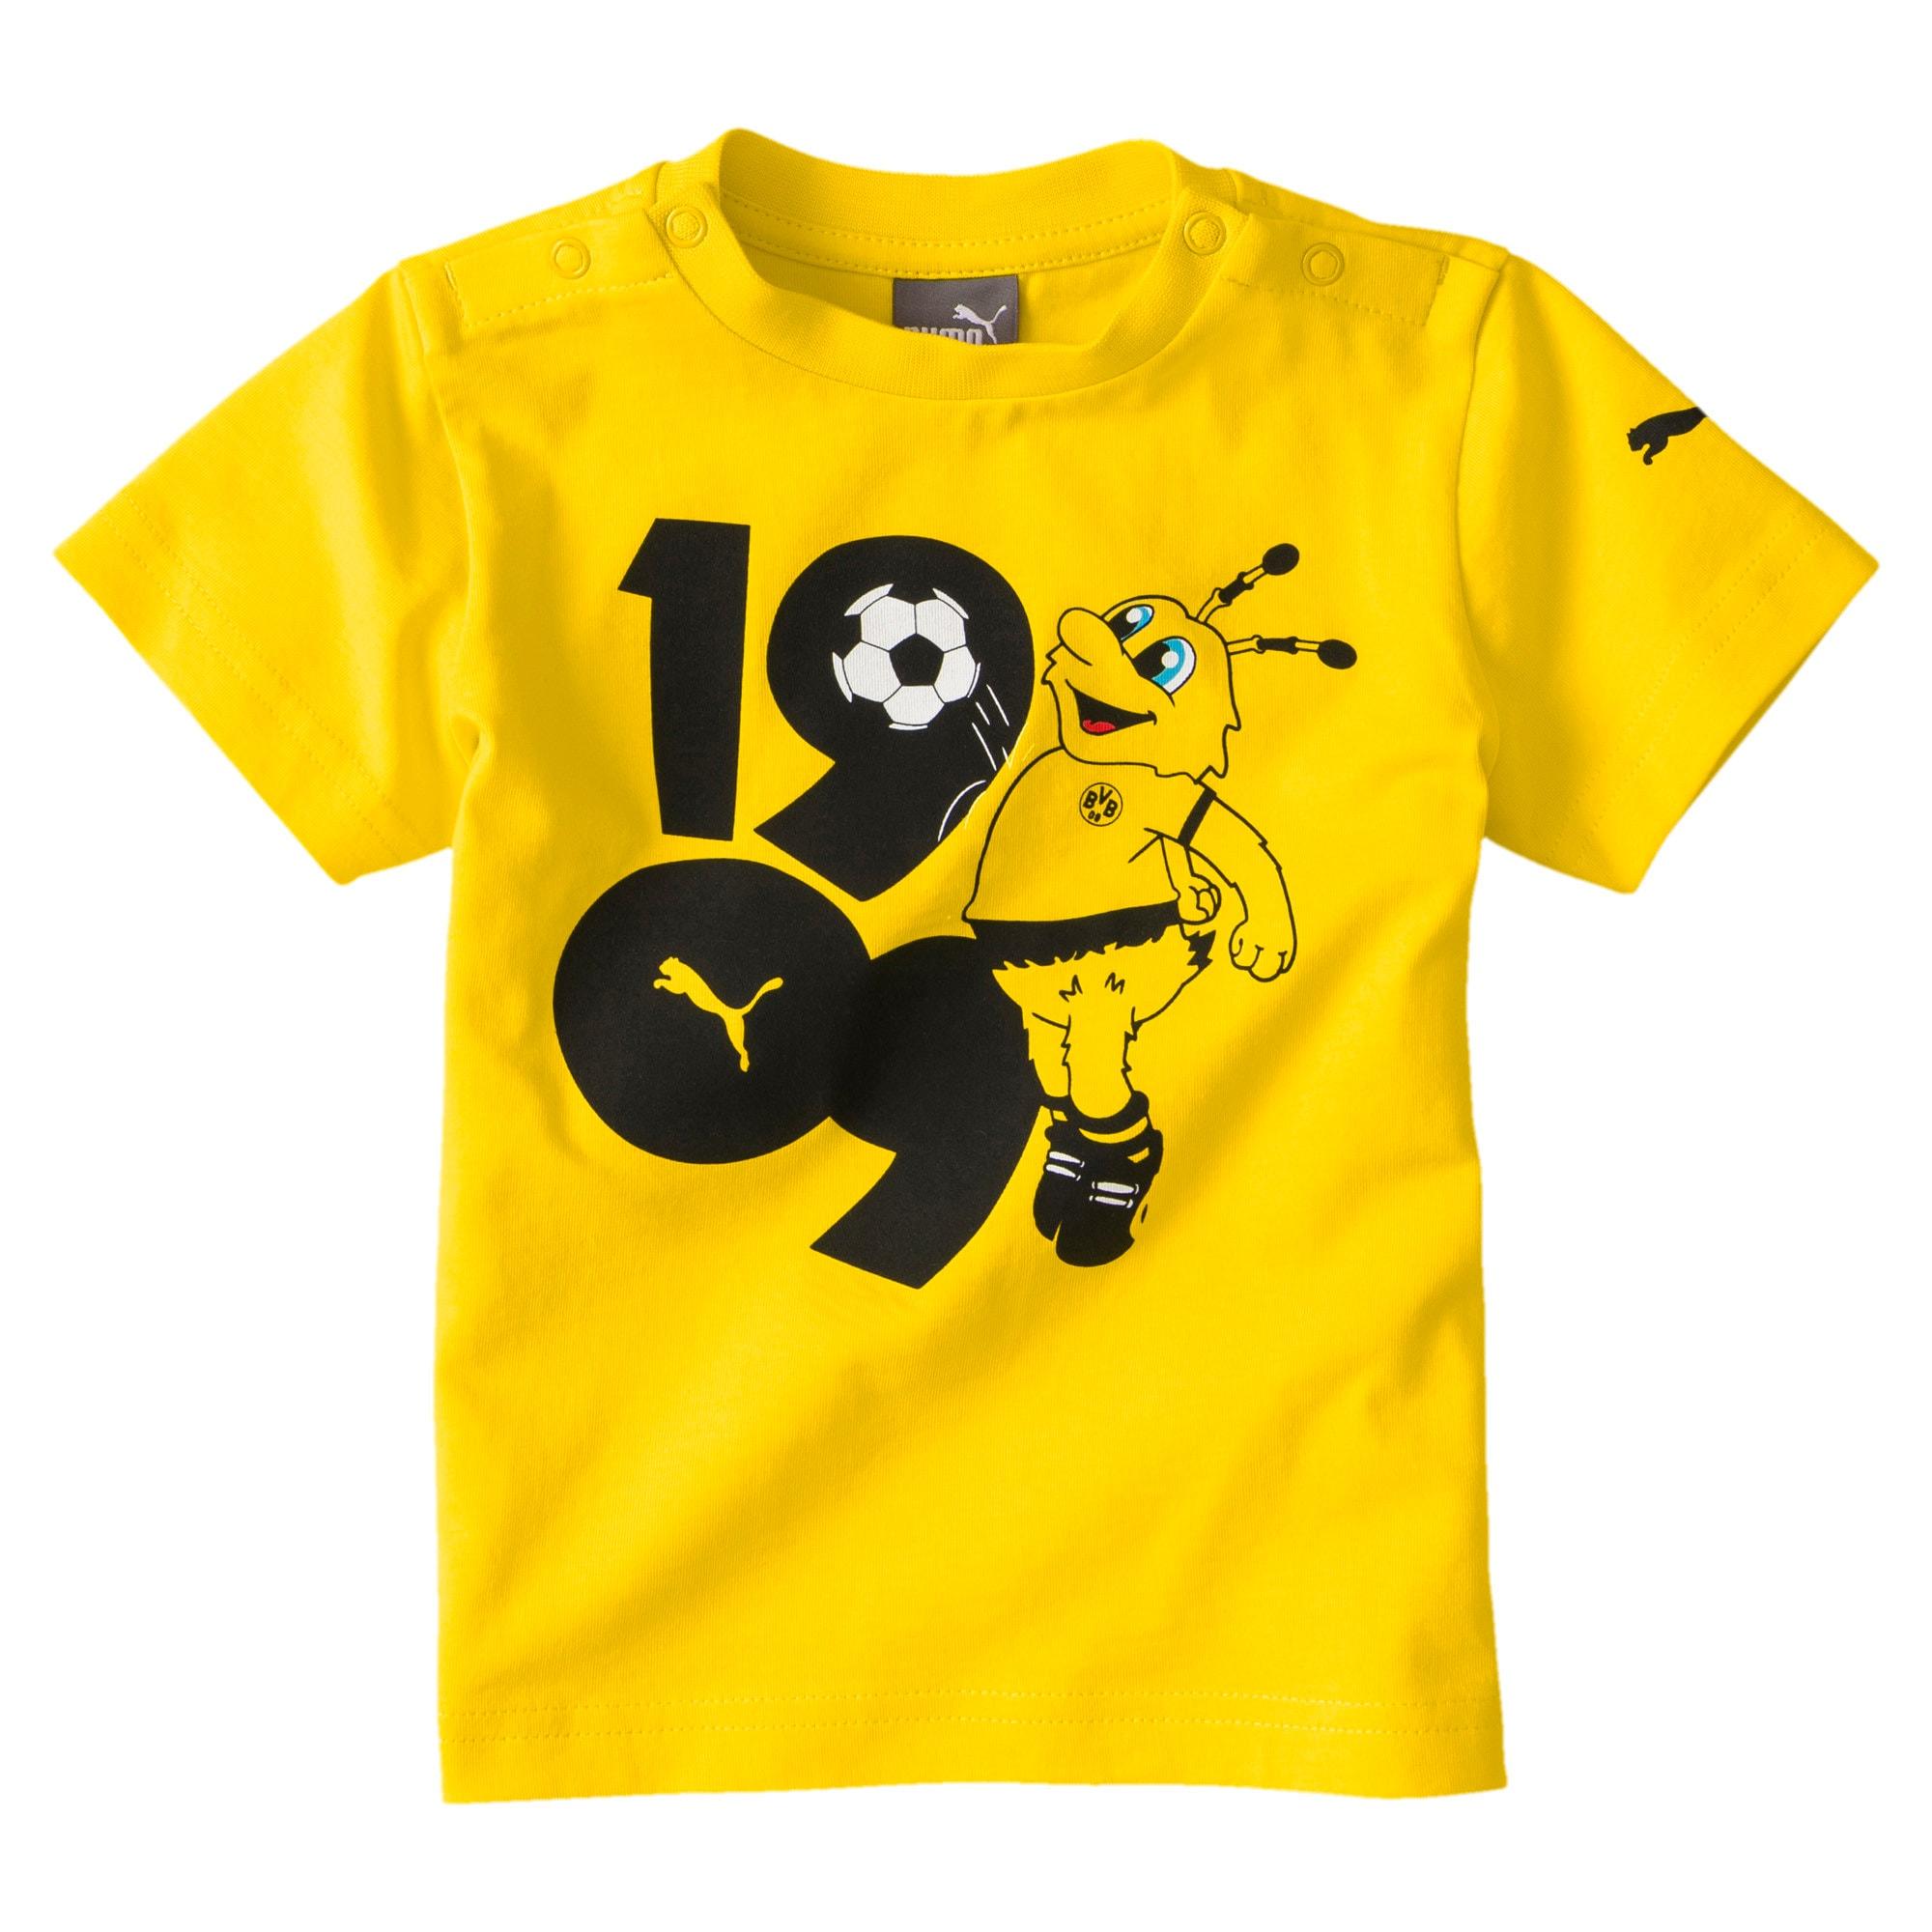 Thumbnail 1 of BVB Minicats Graphic Kids' Tee, Cyber Yellow, medium